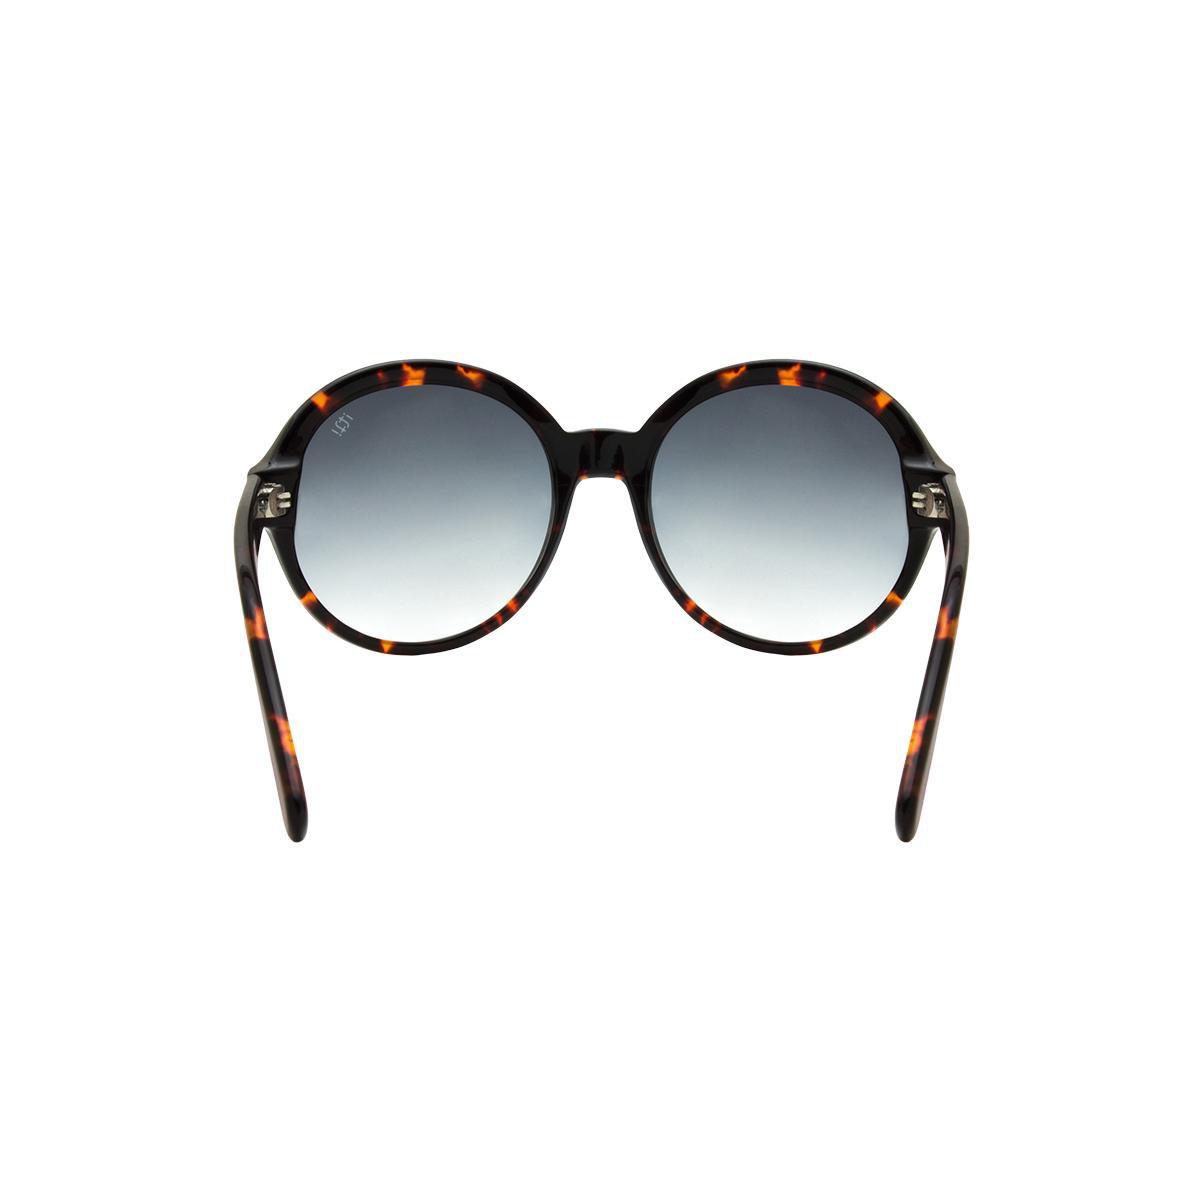 Óculos De Sol It Eyewear Luxe A102 - C3 - Feminino - Compre Agora ... 0af2e3b72b